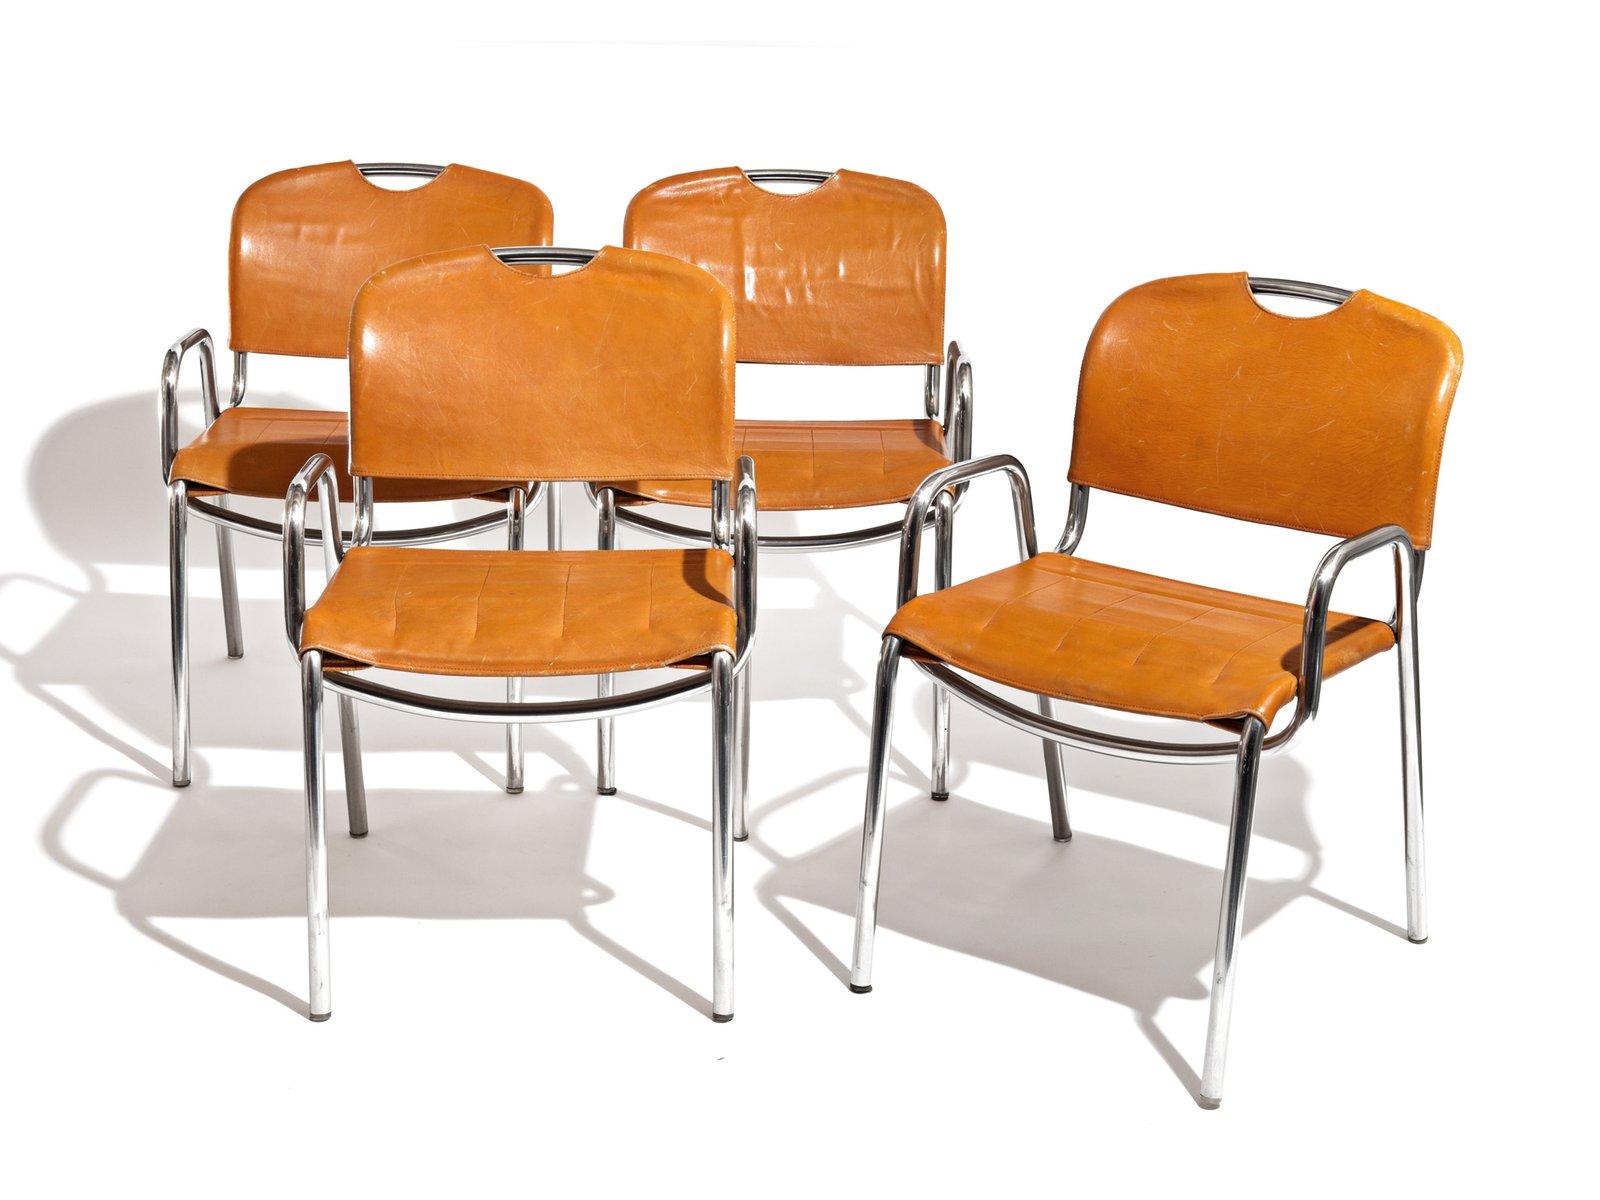 castiglia st hle von a castiglioni m minale f r zanotta 4er set bei pamono kaufen. Black Bedroom Furniture Sets. Home Design Ideas